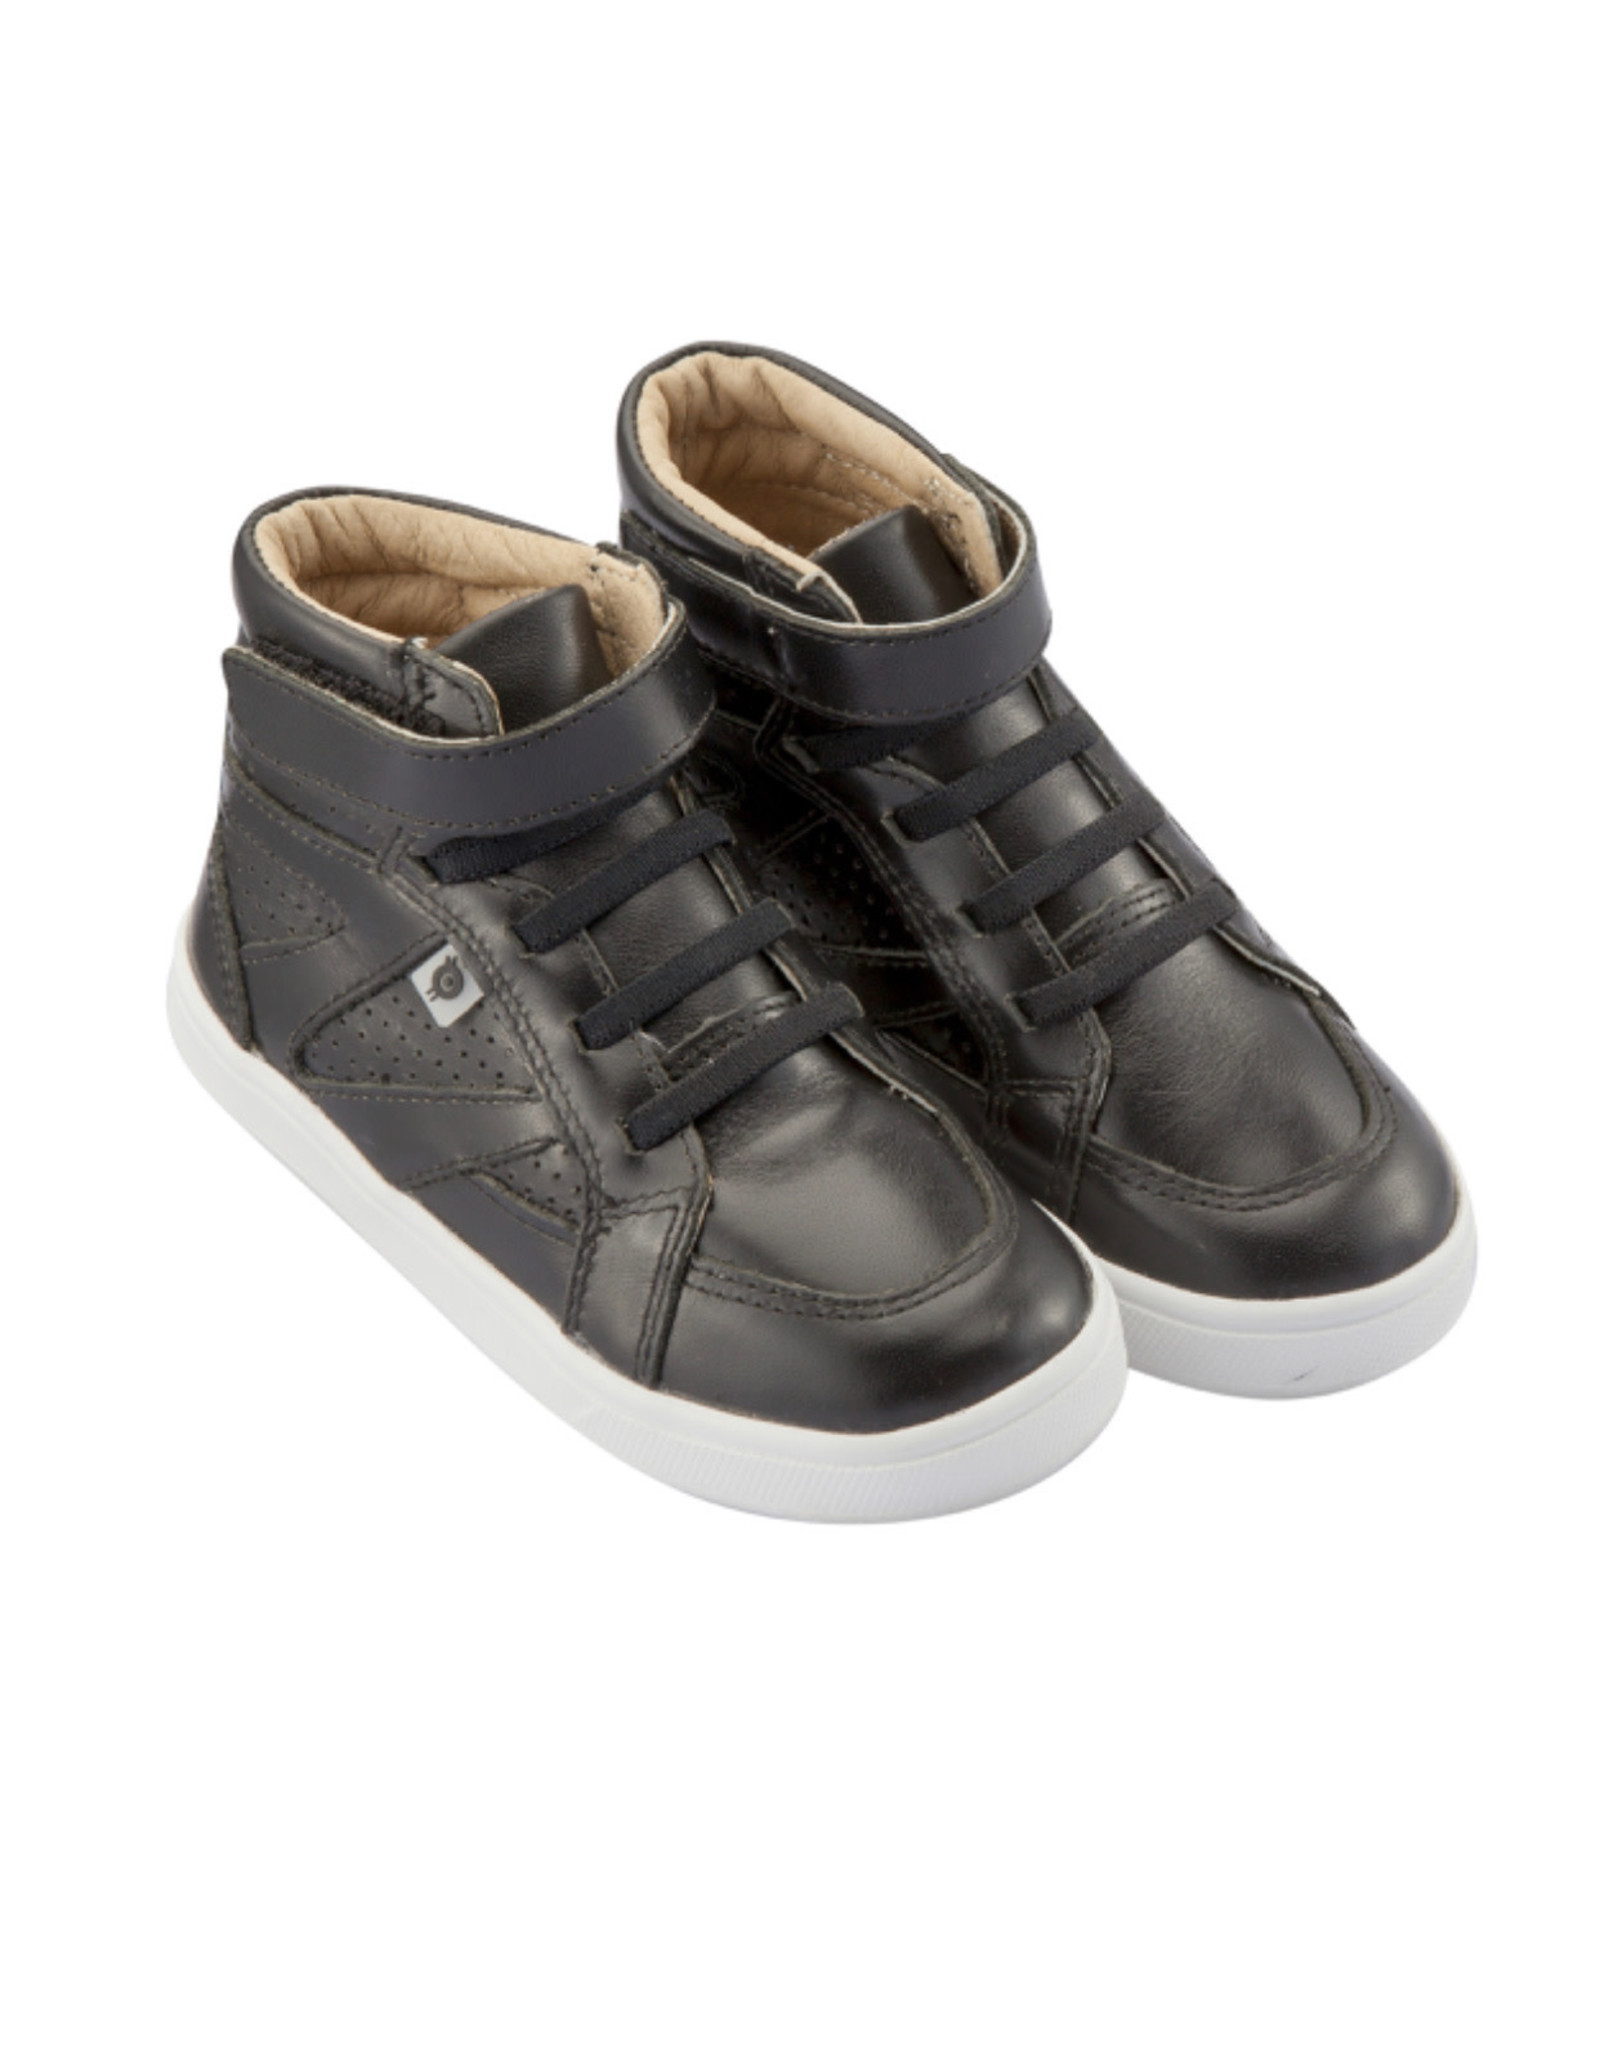 old soles Old Soles 6001 Starter Shoe Nero